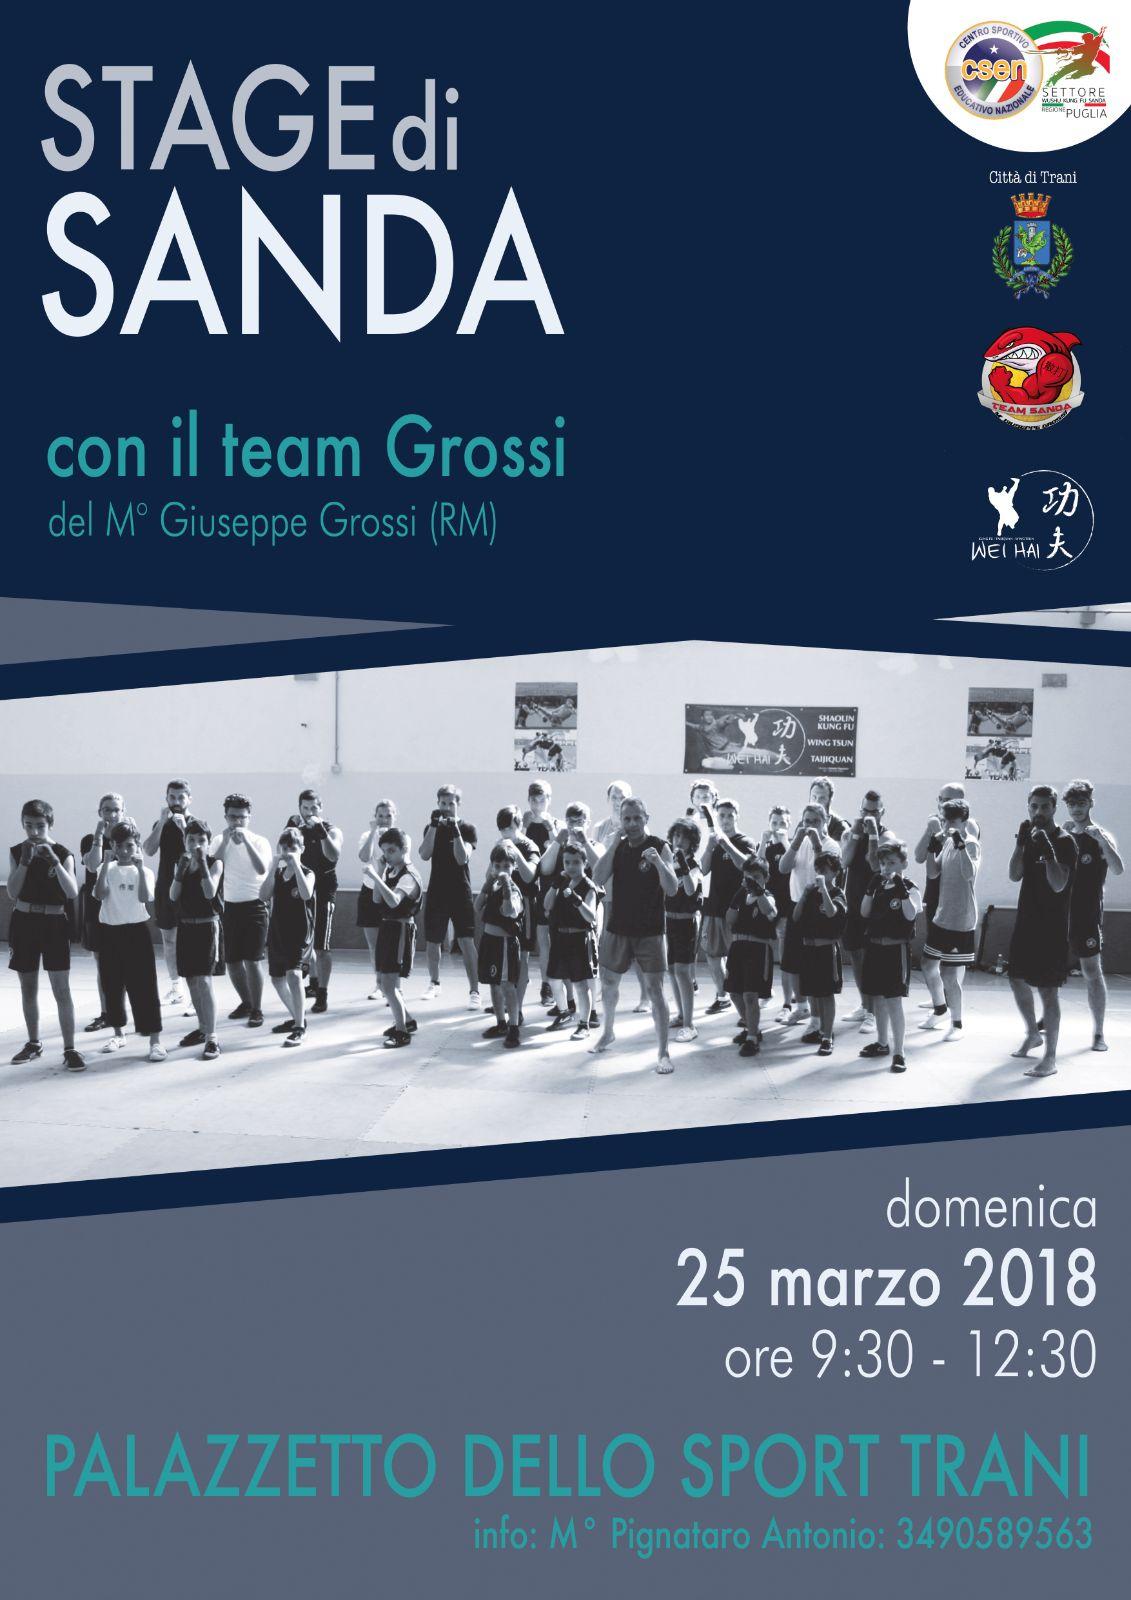 25 marzo 2018 Stage Sanda